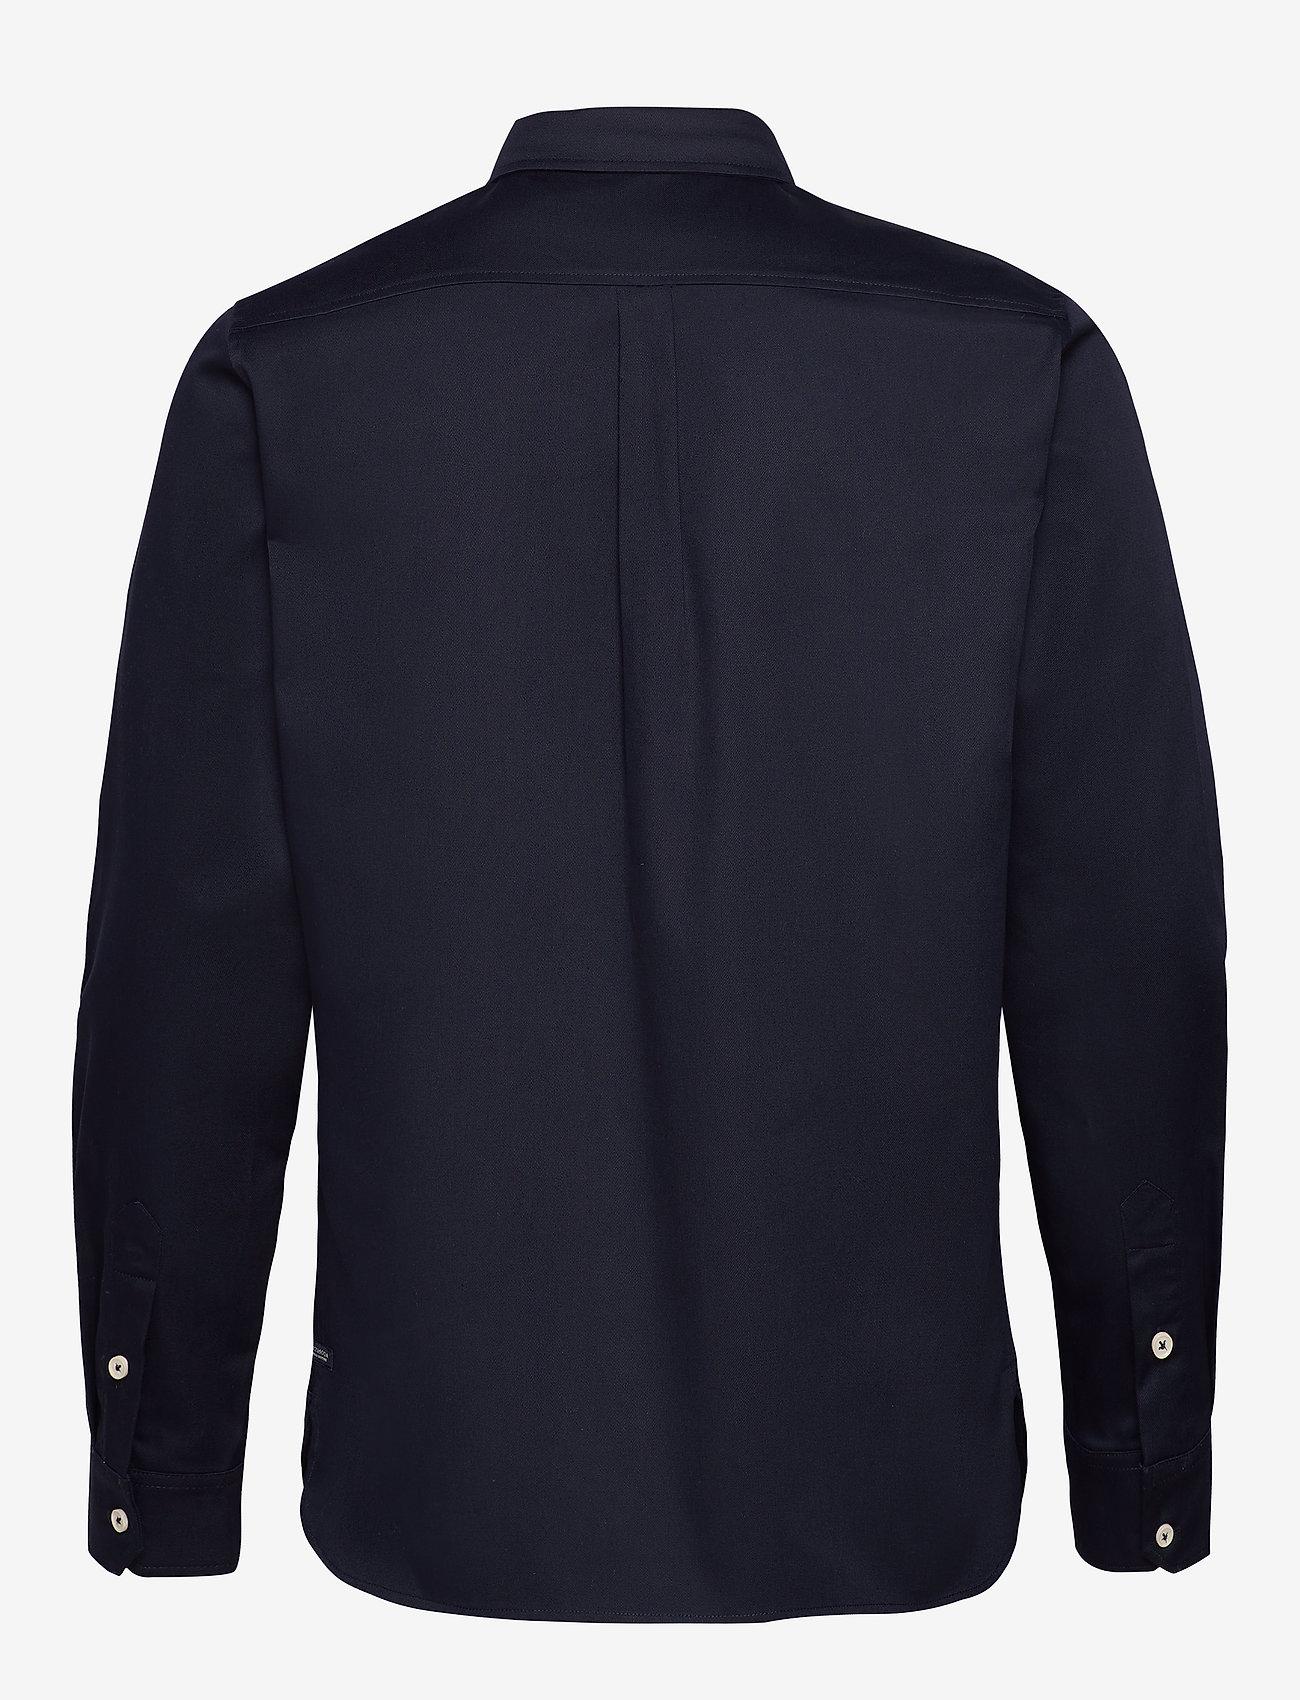 Scotch & Soda - Longsleeve clean utility shirt - basic shirts - night - 1